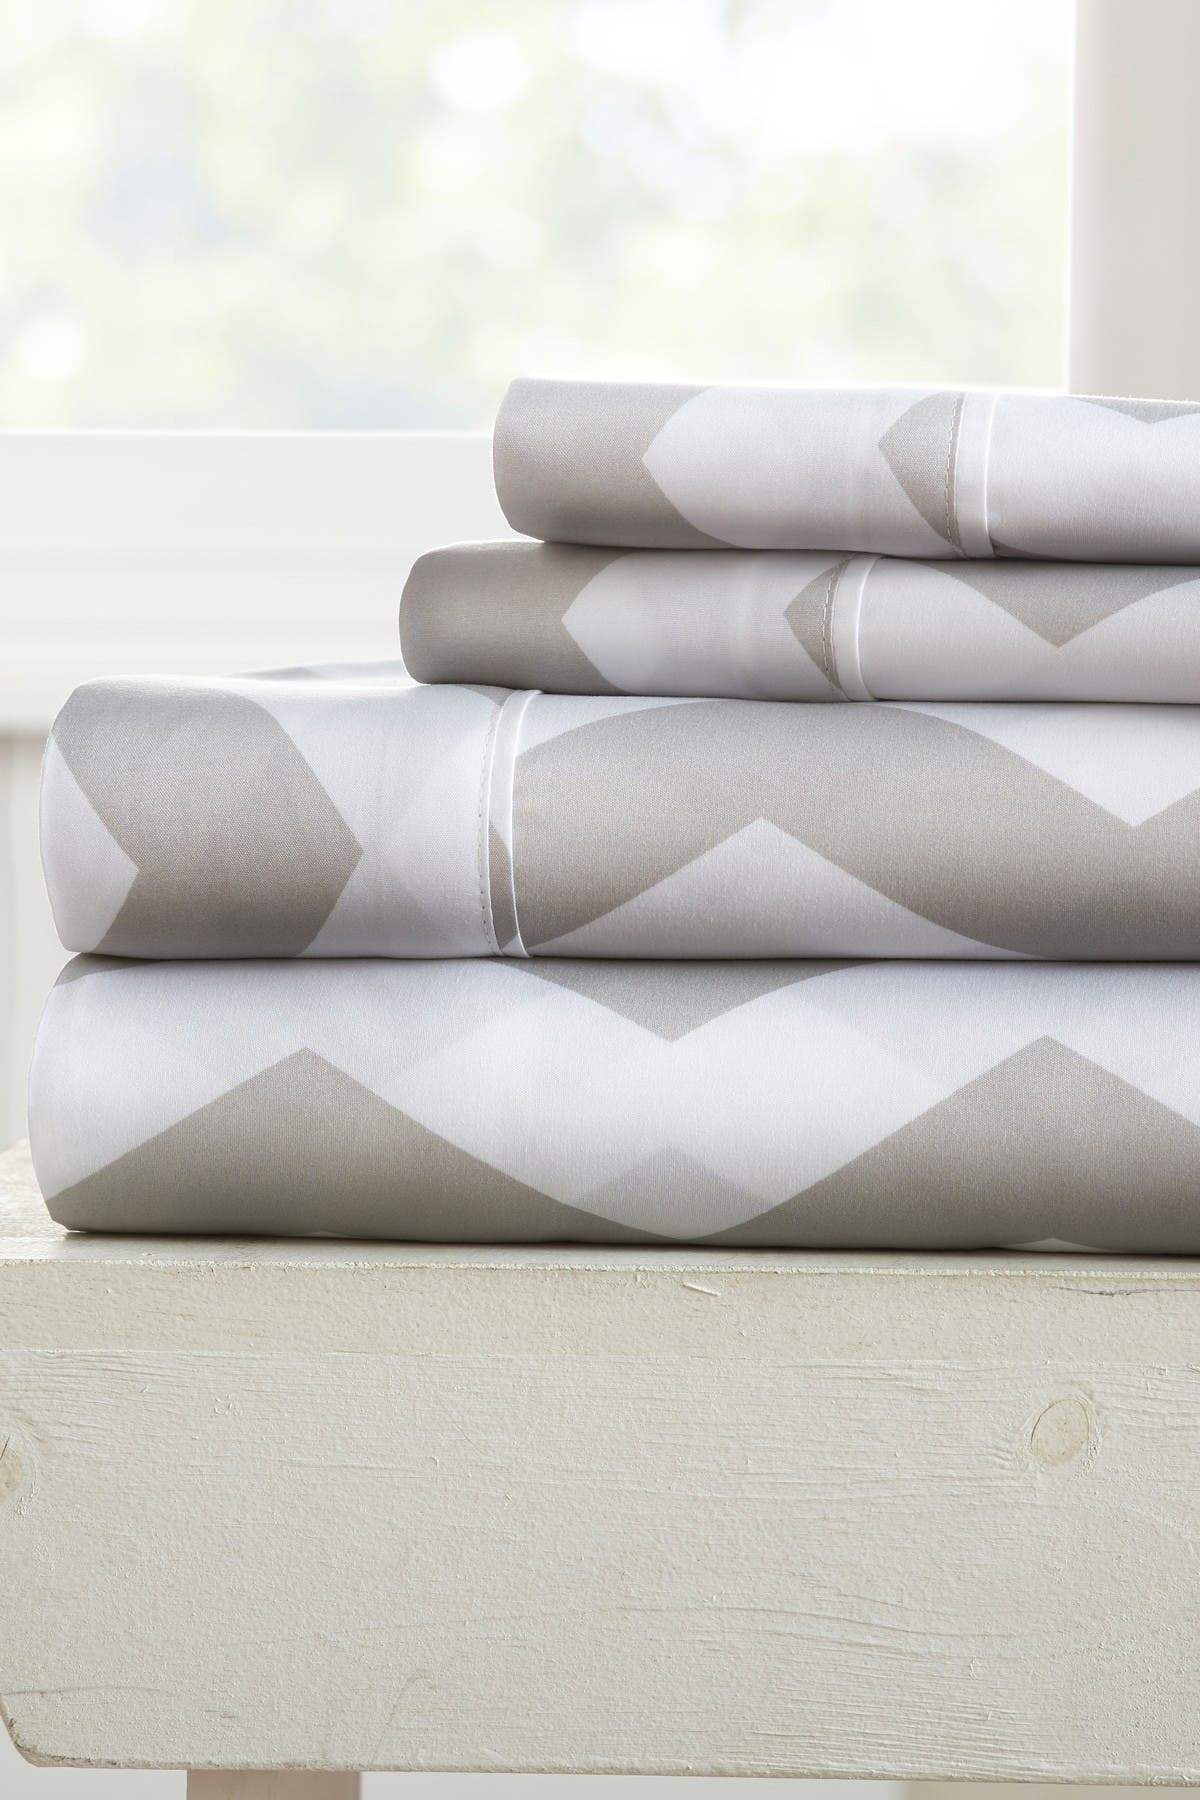 Image of IENJOY HOME The Home Spun Premium Ultra Soft Arrow Pattern 4-Piece Queen Bed Sheet Set - Gray